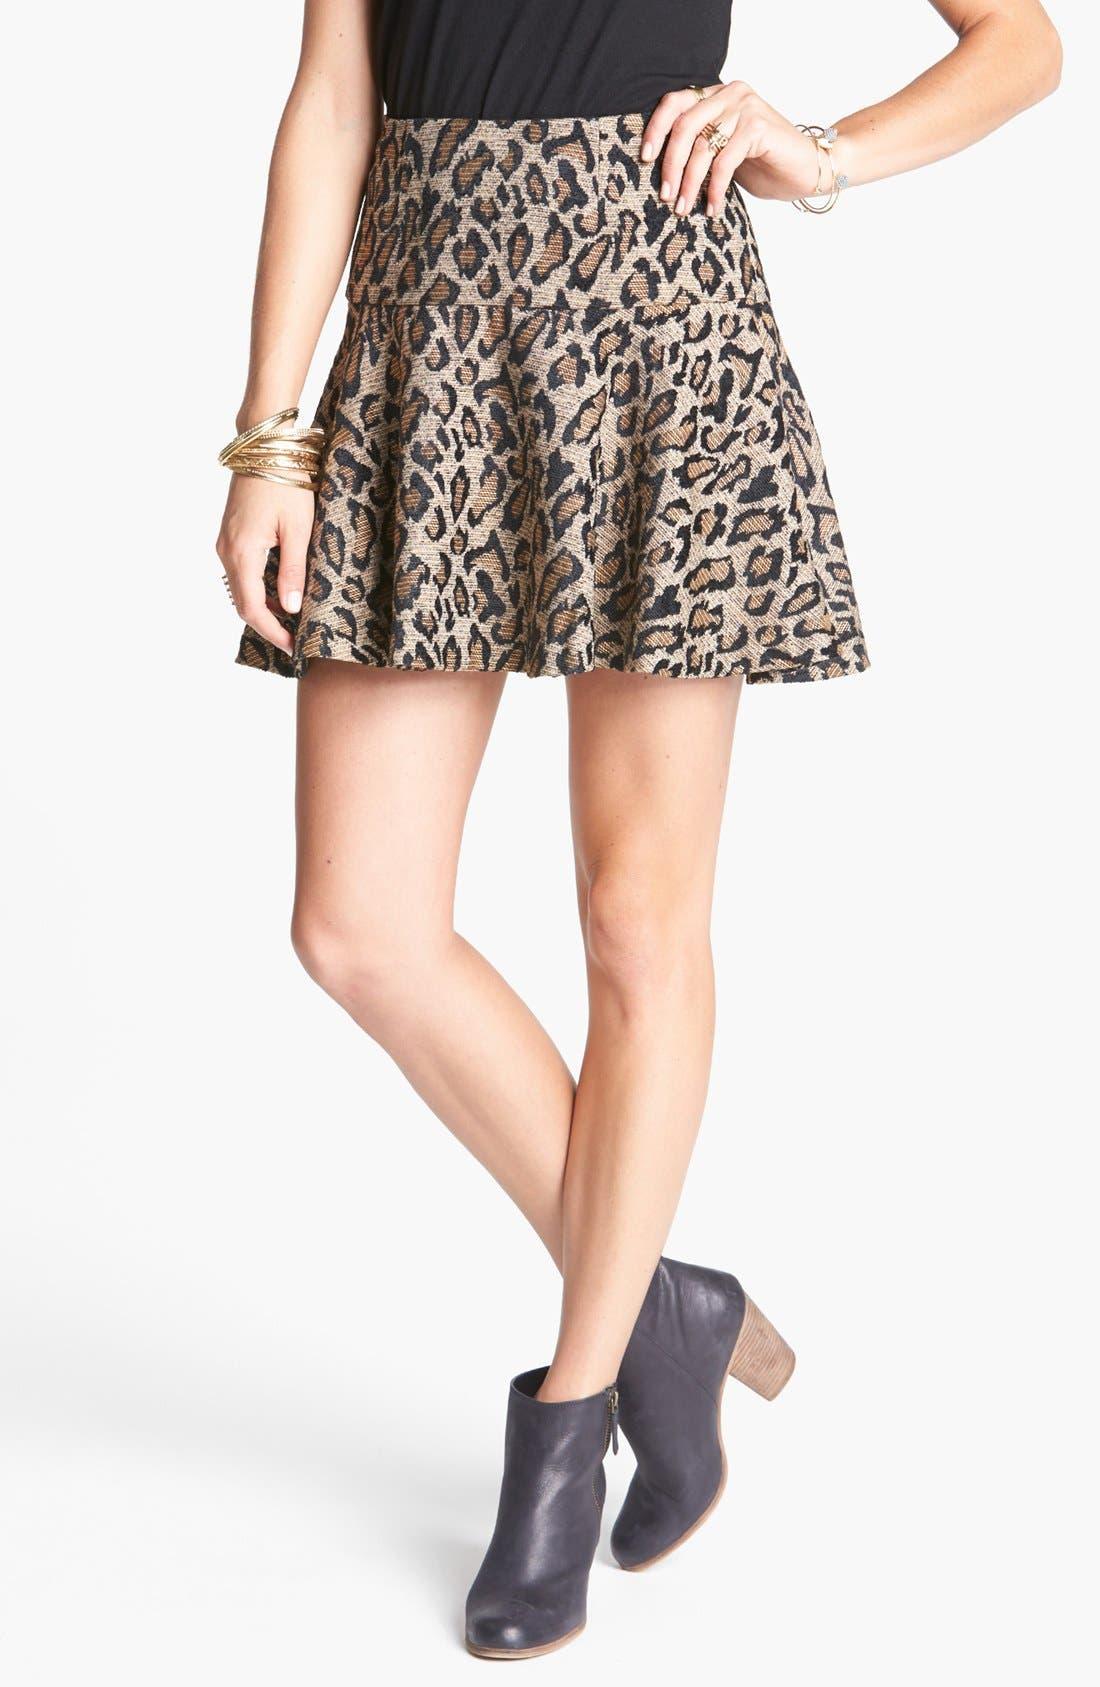 Alternate Image 1 Selected - Free People Cheetah Jacquard Skirt